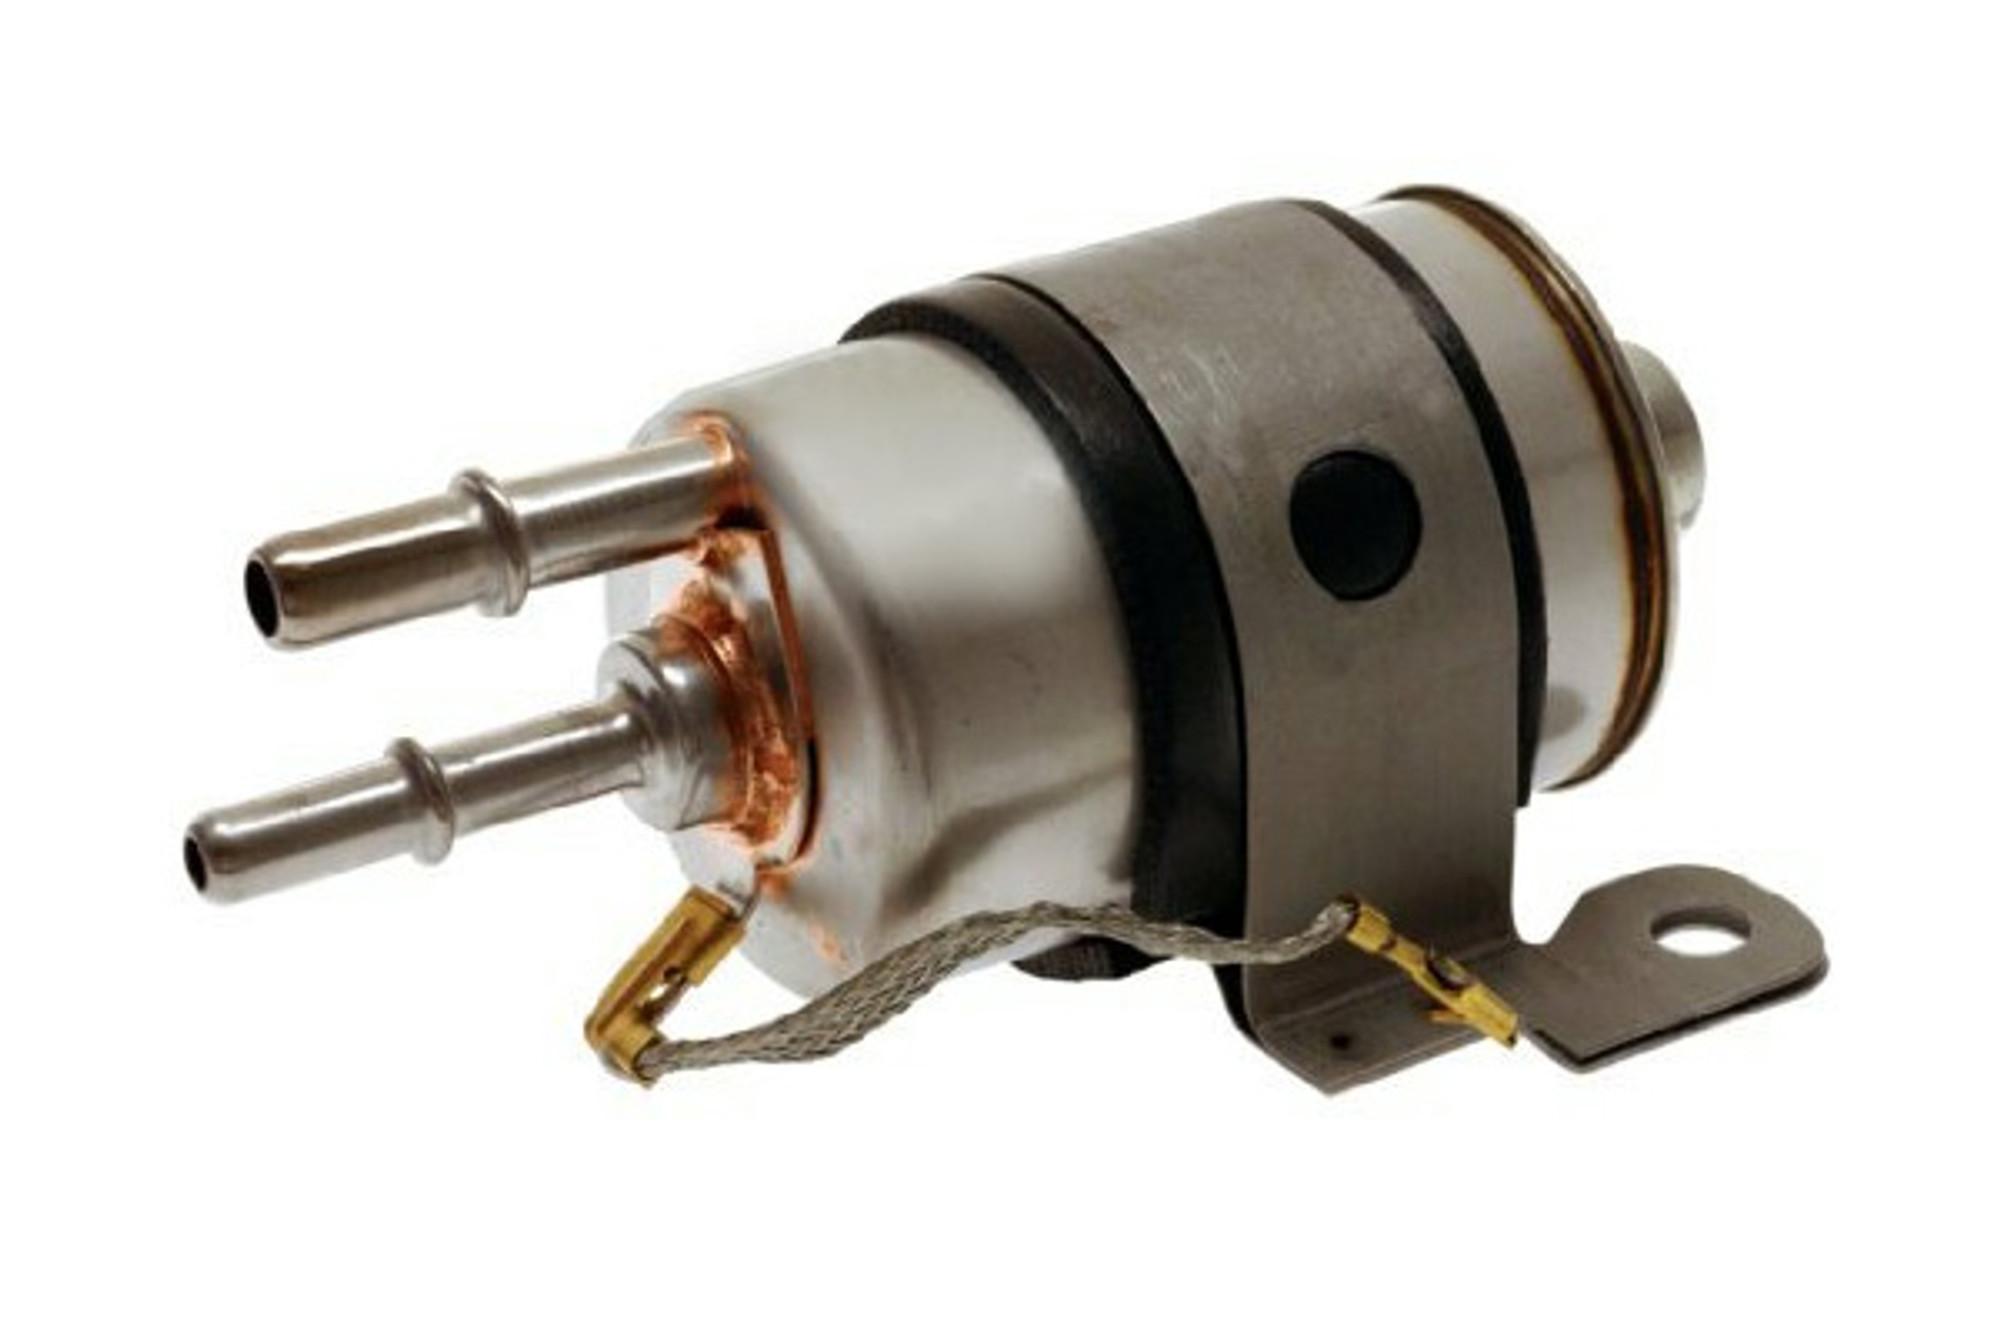 gm fuel filter and regulator for c5 corvette and custom applications pn:  19239926 - tick performance, inc